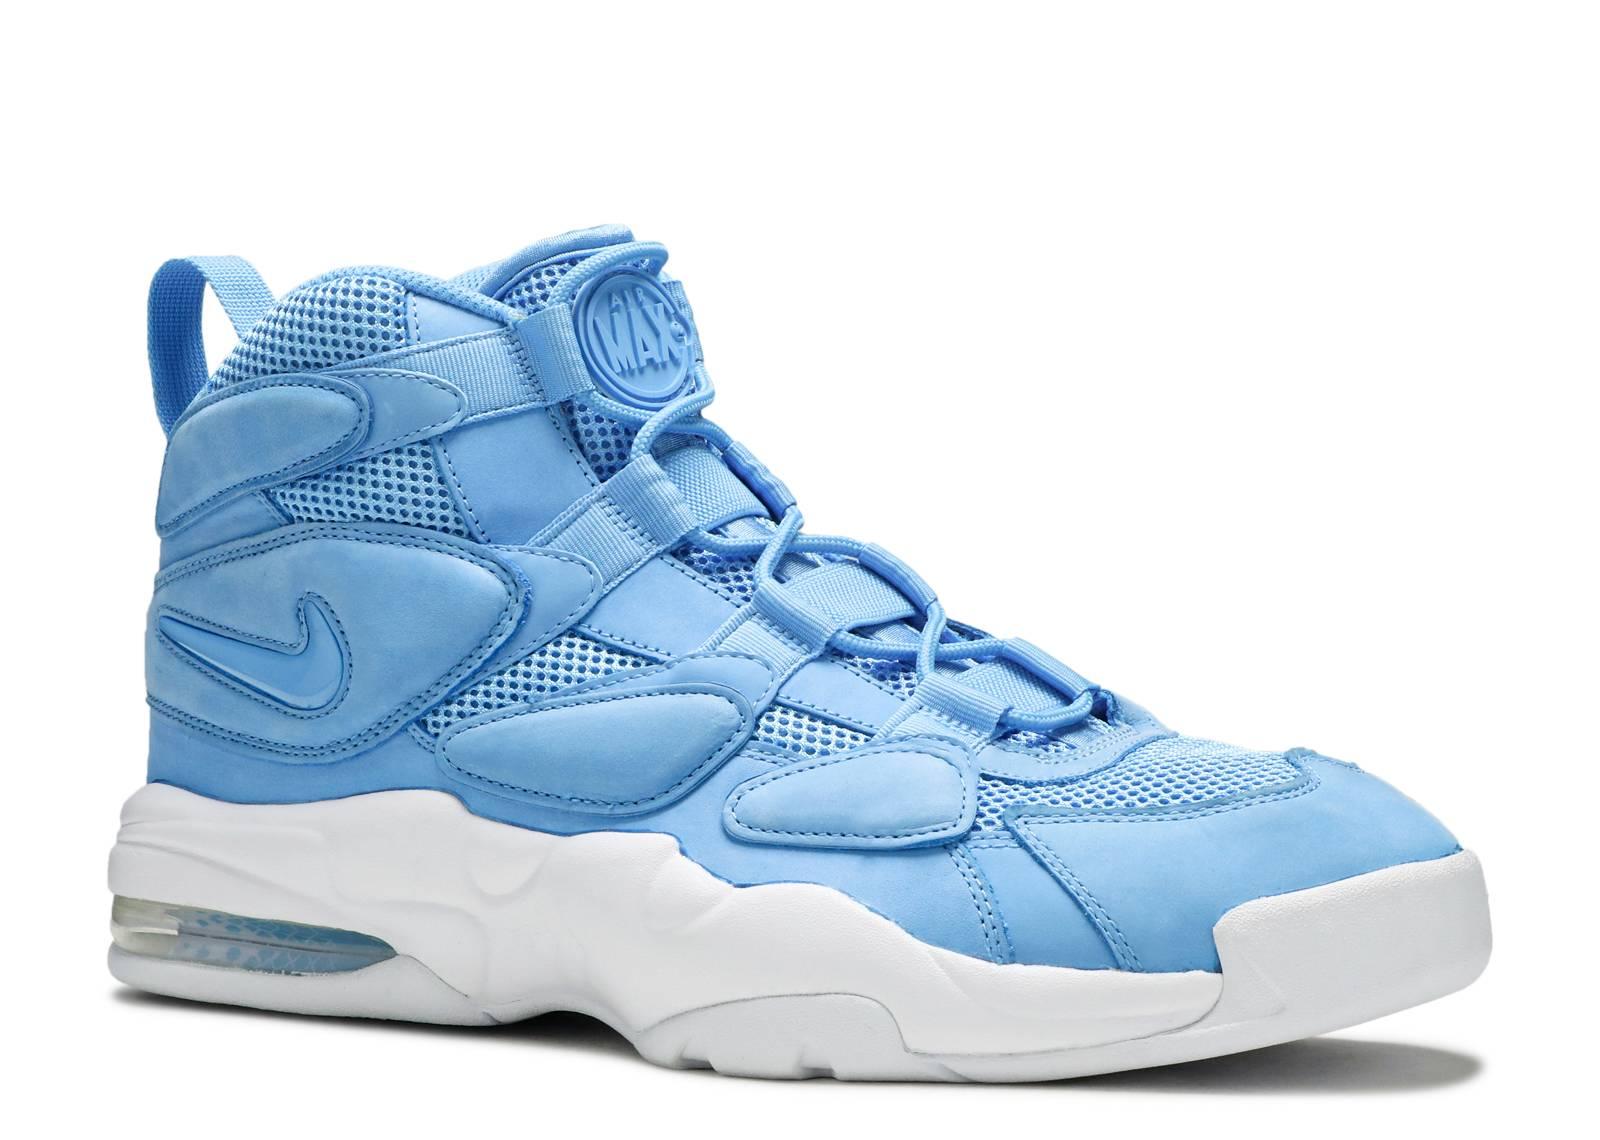 Air Max 2 Uptempo 94 As Qs Nike 922931 400 university